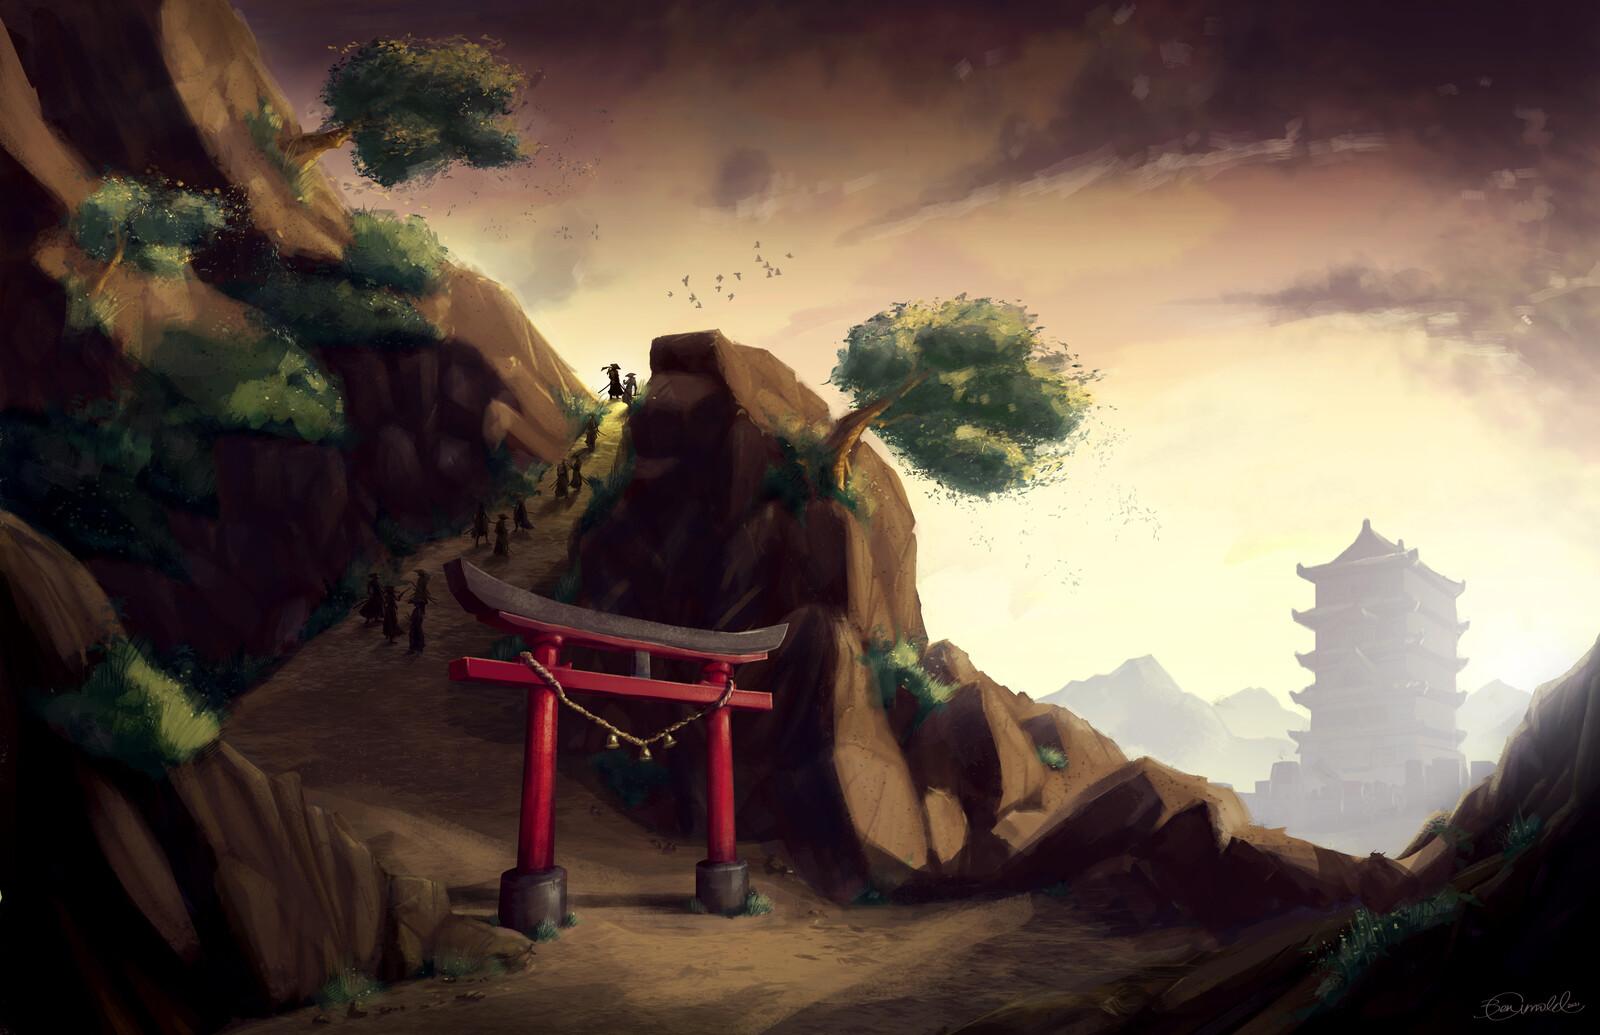 Environment Design Study: Feudal Japan